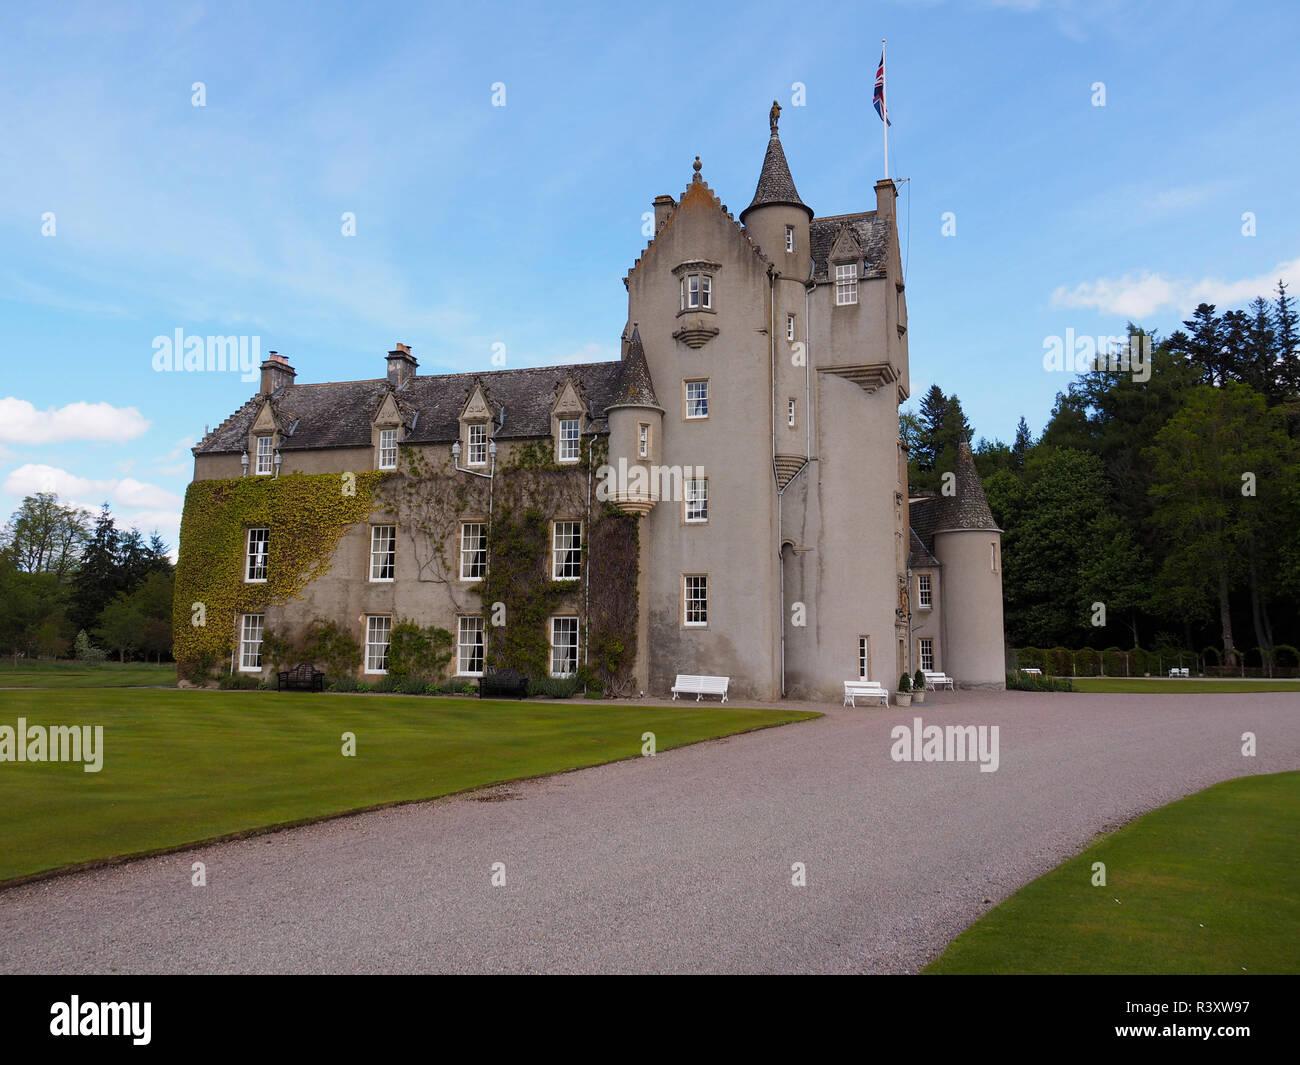 Ballindalloch Castle Scottish Highlands rear view - Stock Image